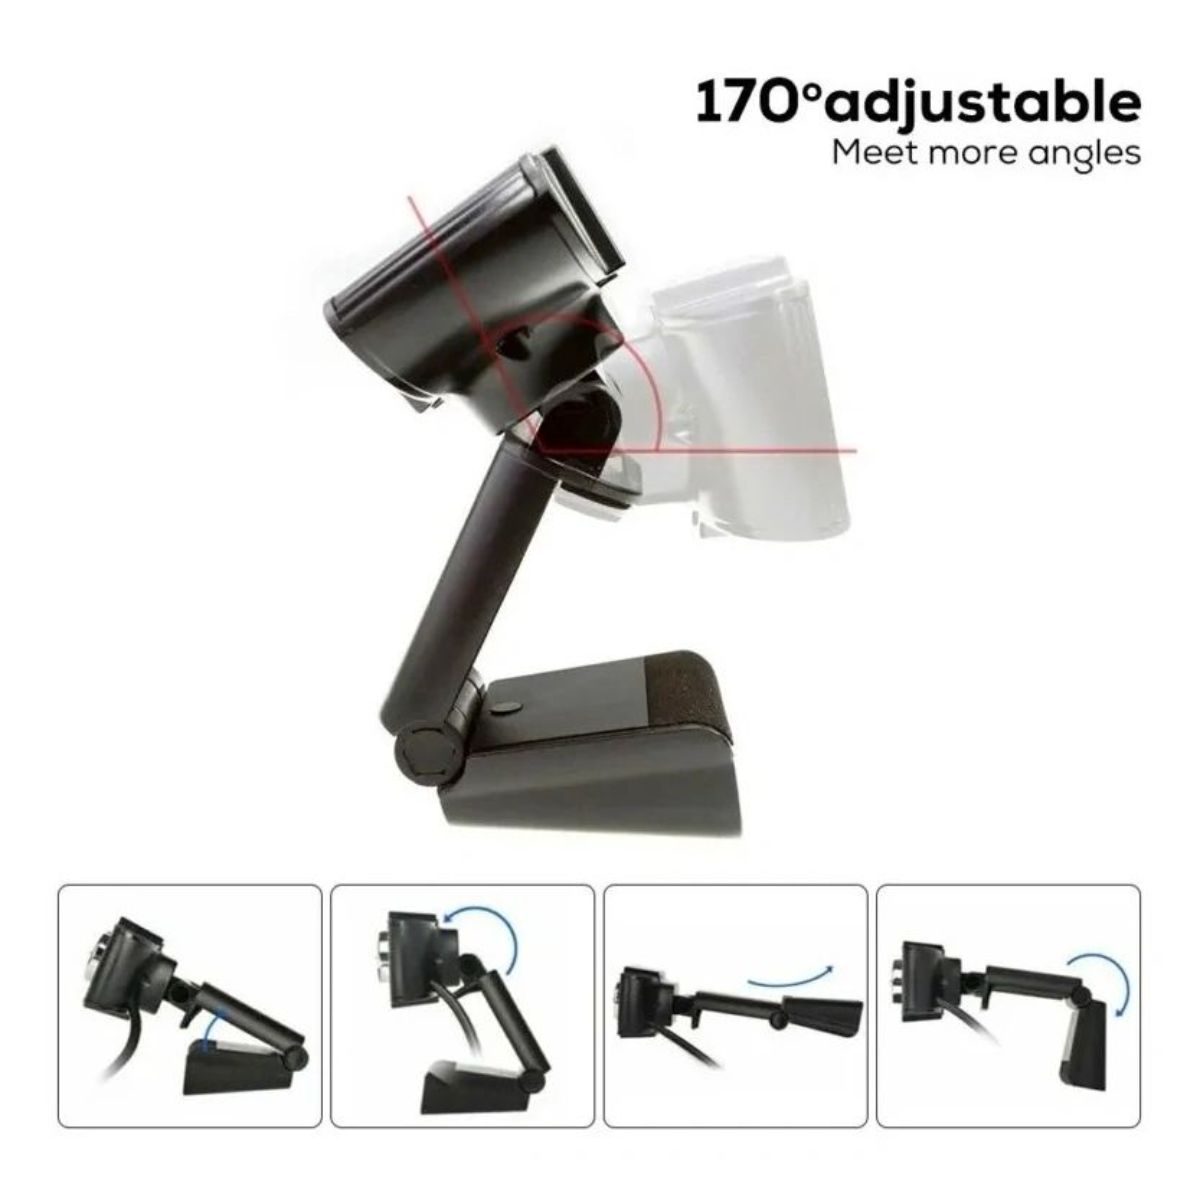 camara web 1080p usb para pc laptop web cam 2 1 1